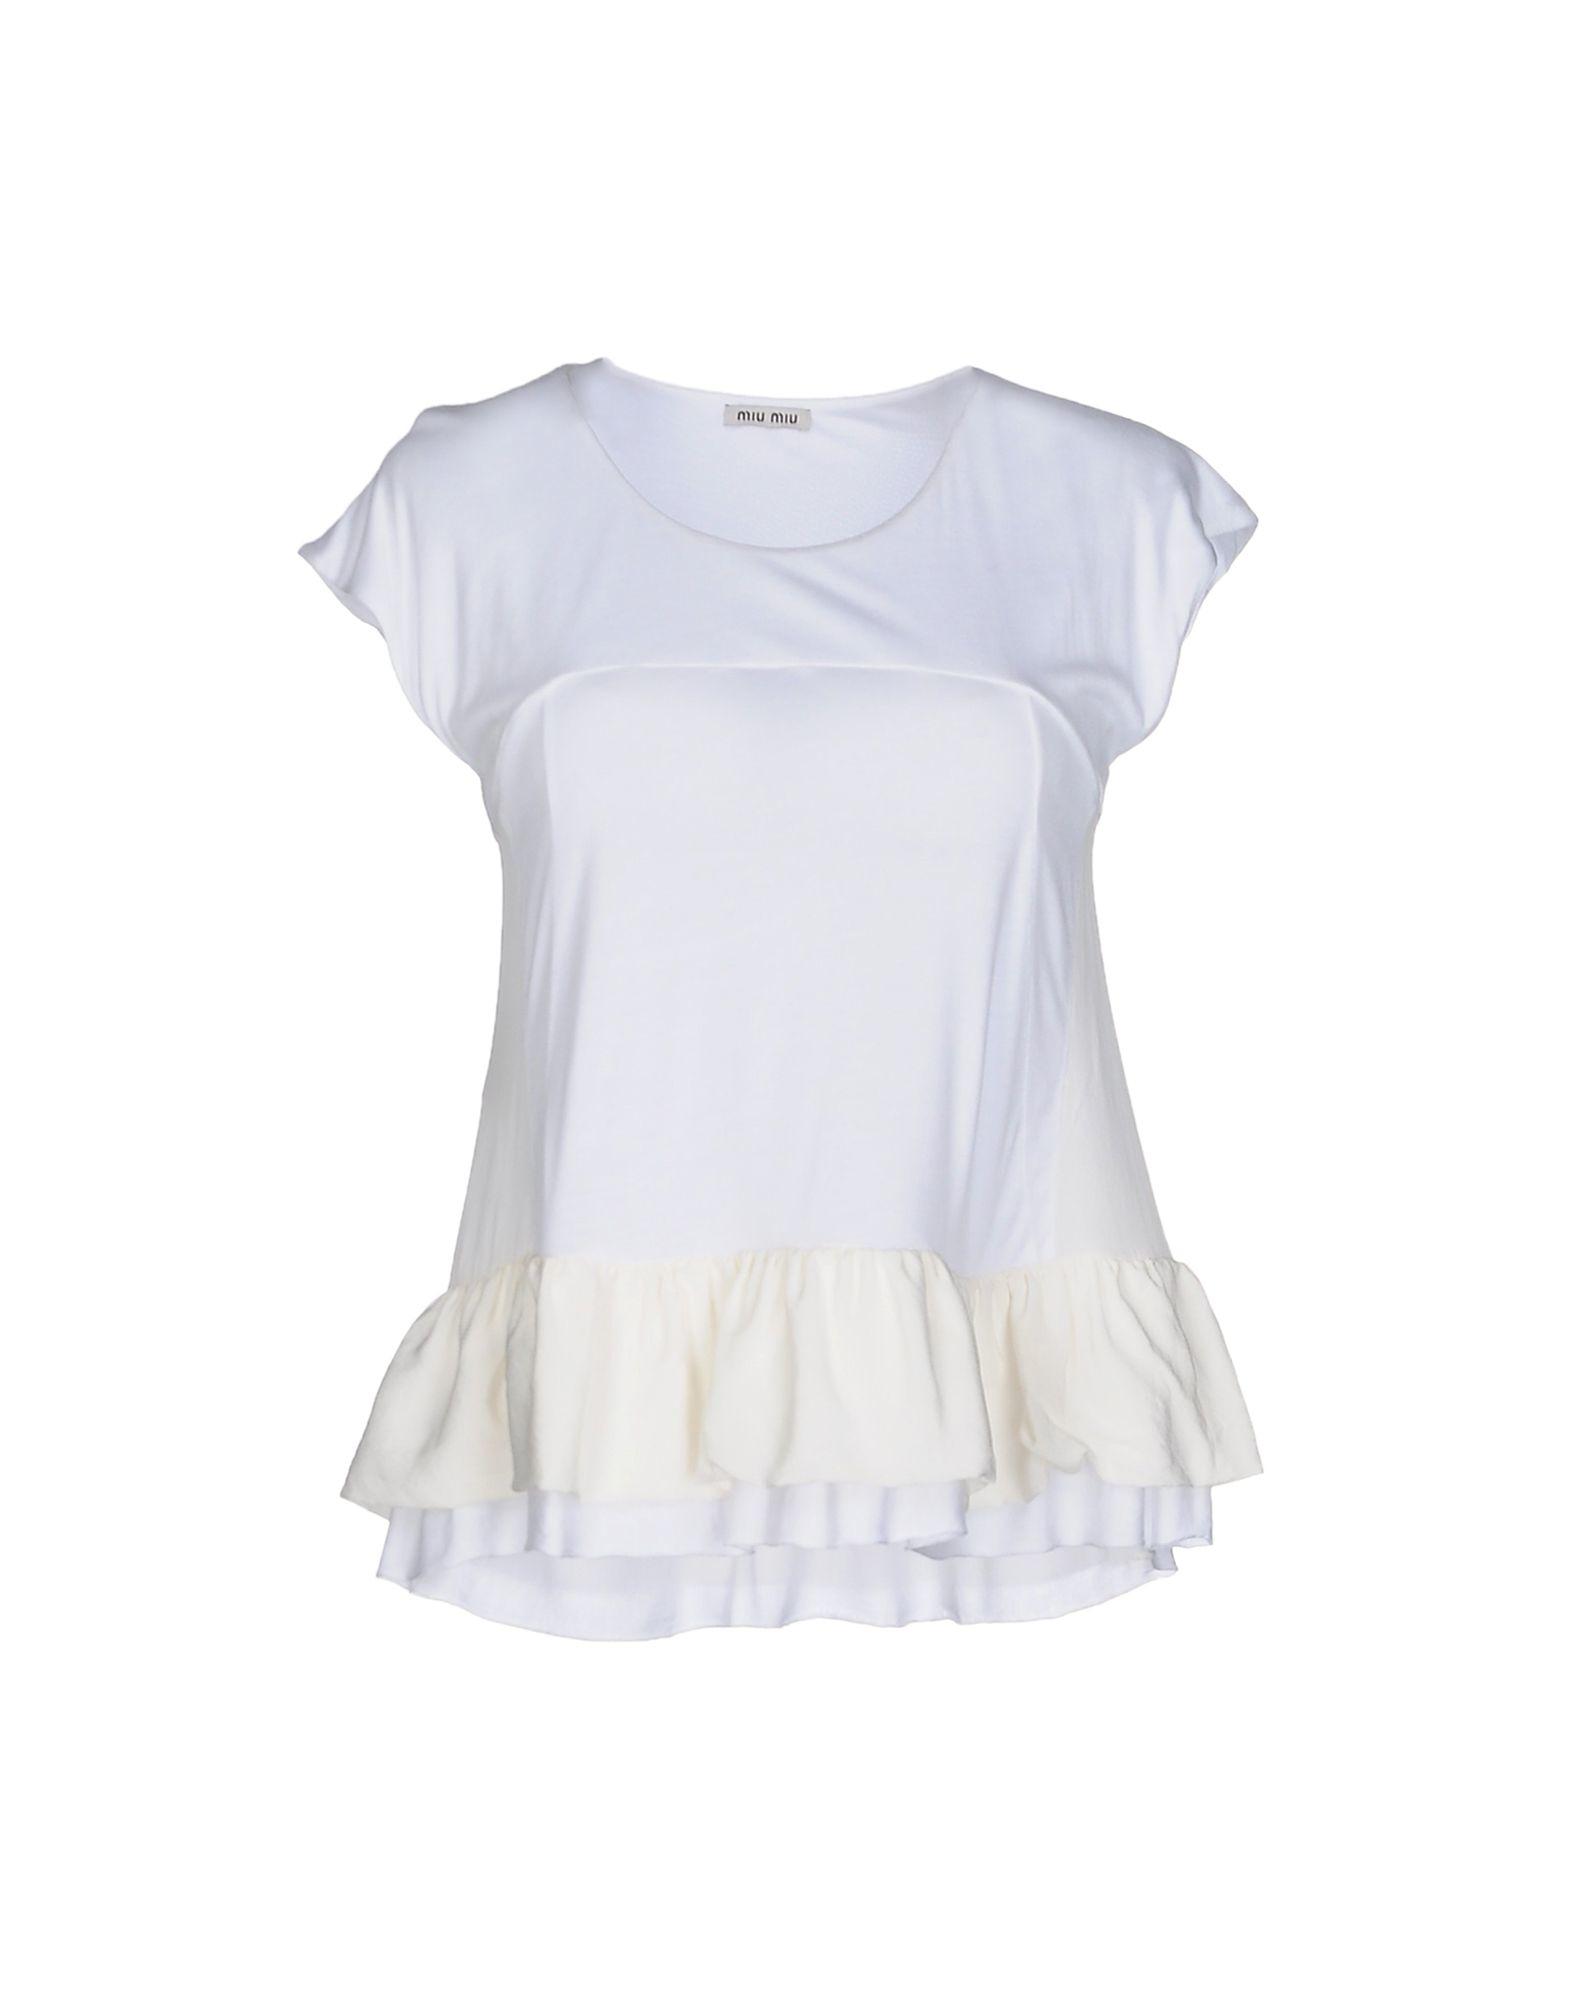 Miu miu t shirt in white save 16 lyst for Miu miu t shirt